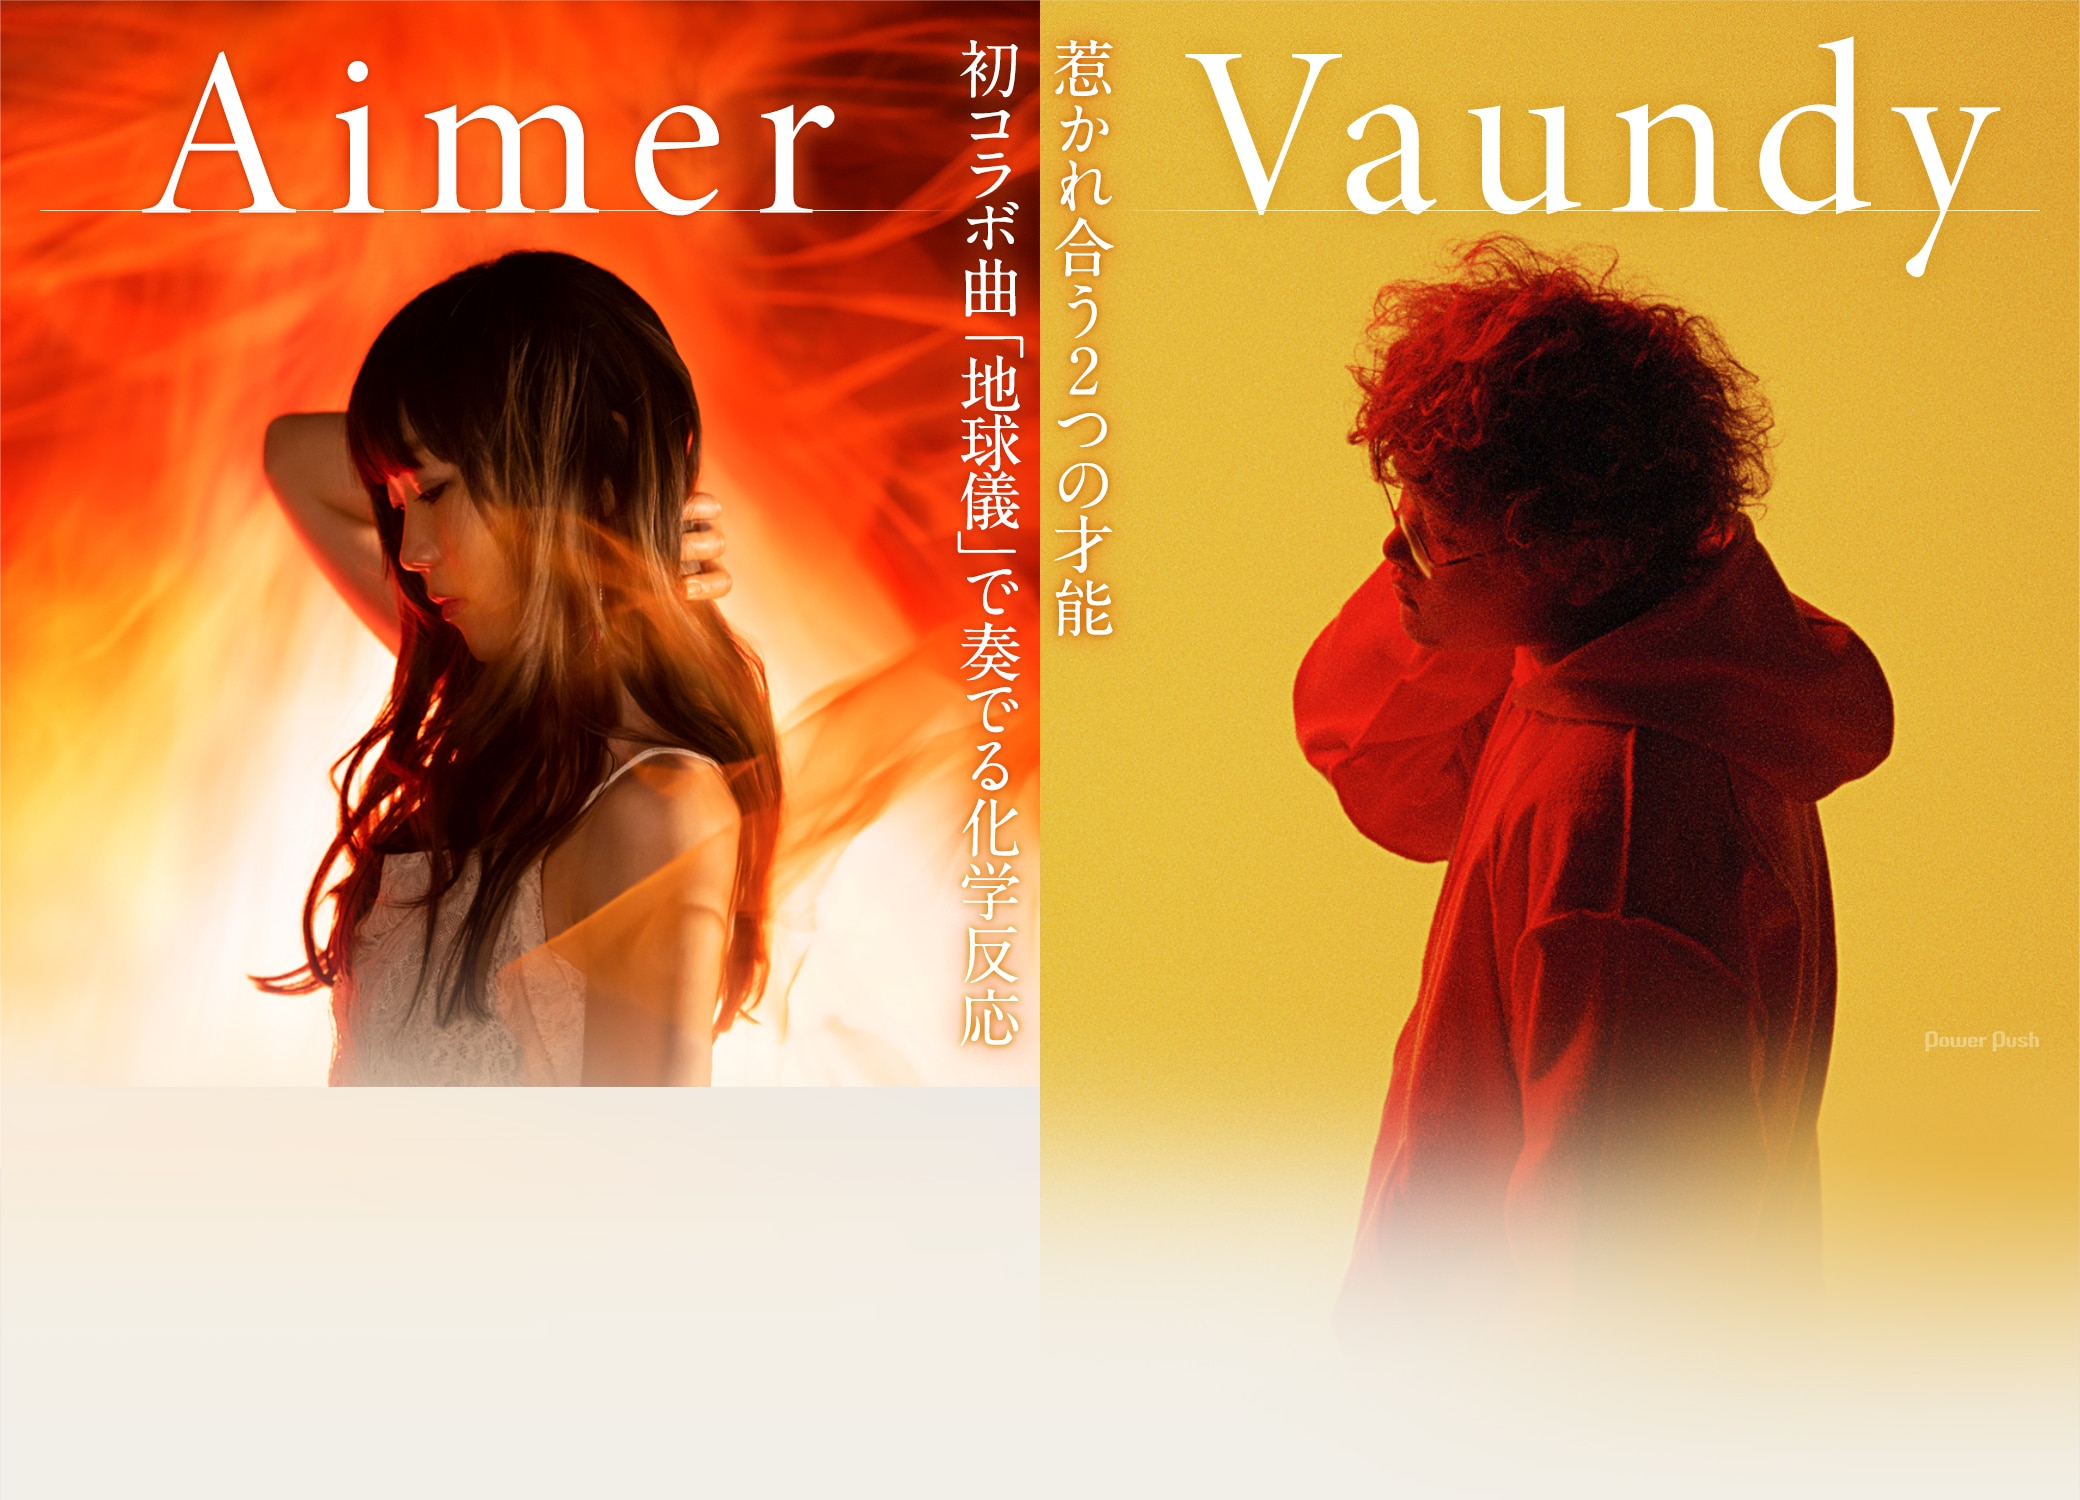 Aimer×Vaundy|惹かれ合う2つの才能 初コラボ曲「地球儀」で奏でる化学反応